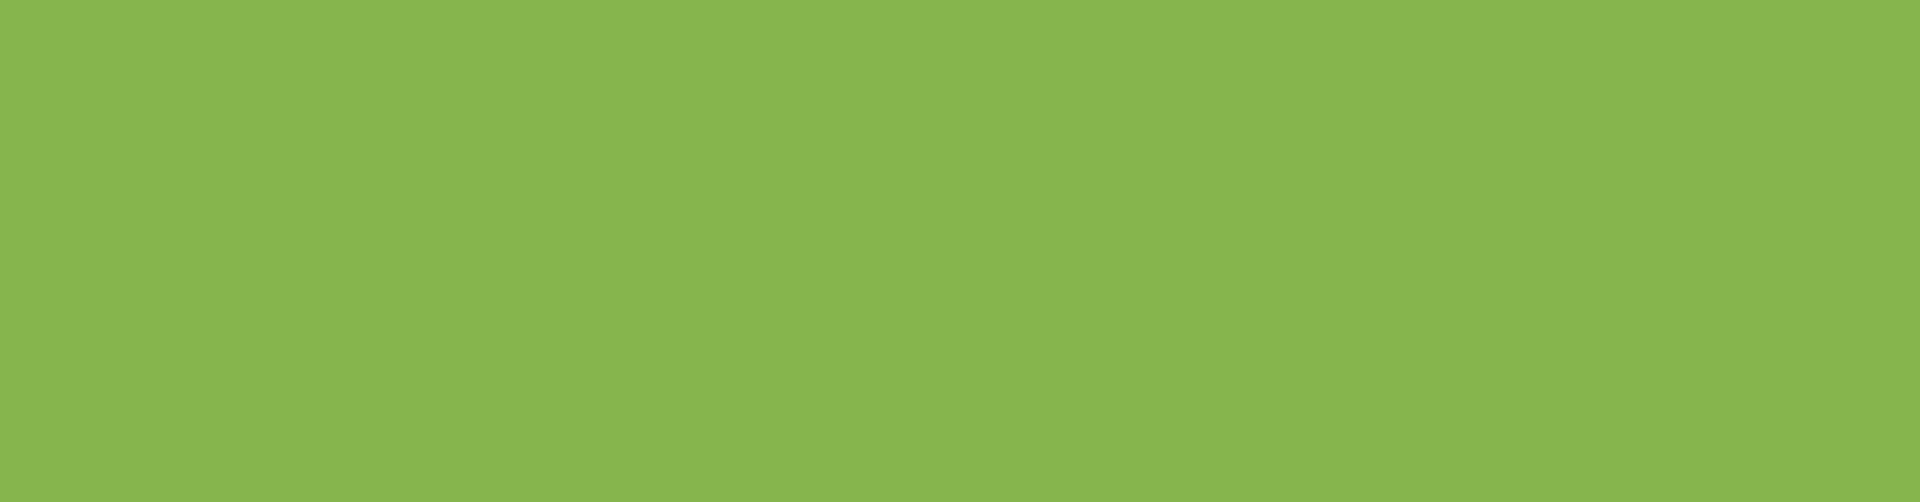 fondo-green